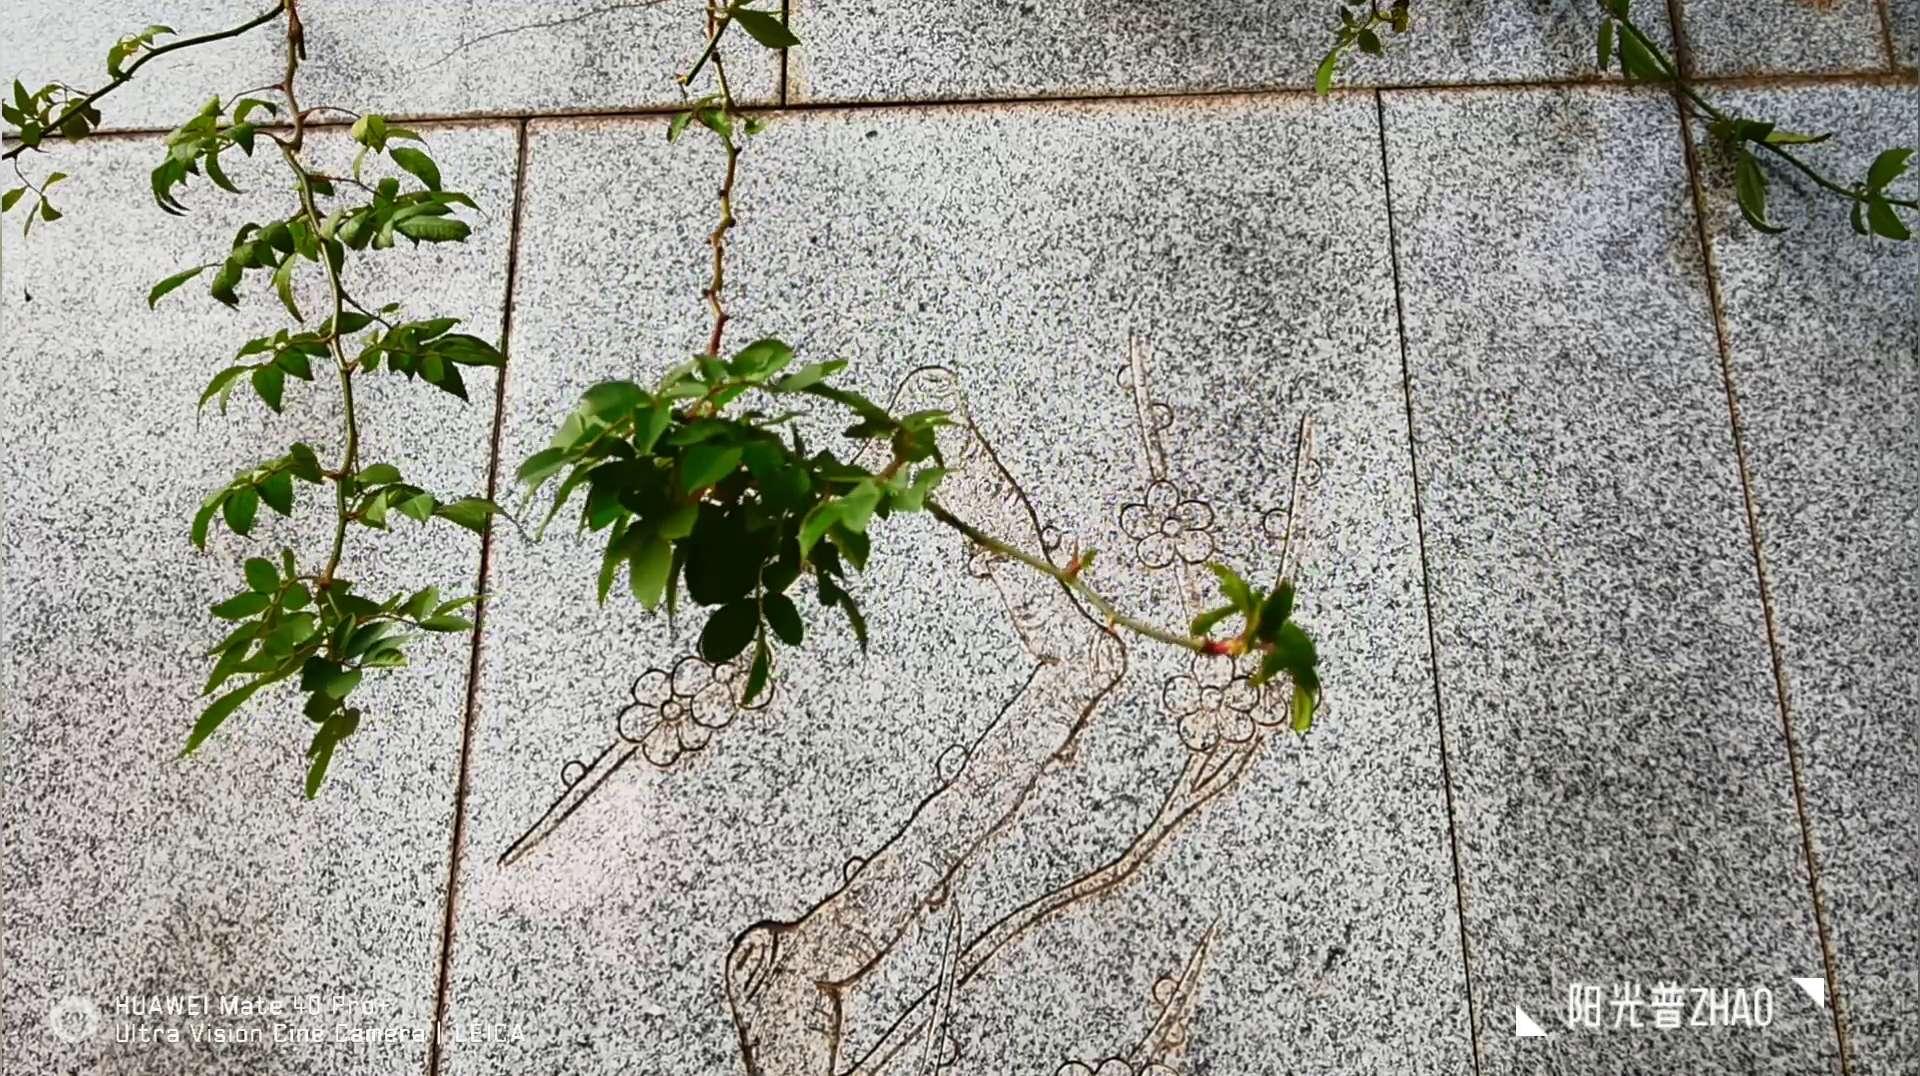 【MATE 40 PRO+】日子,花粉随手拍-花粉俱乐部